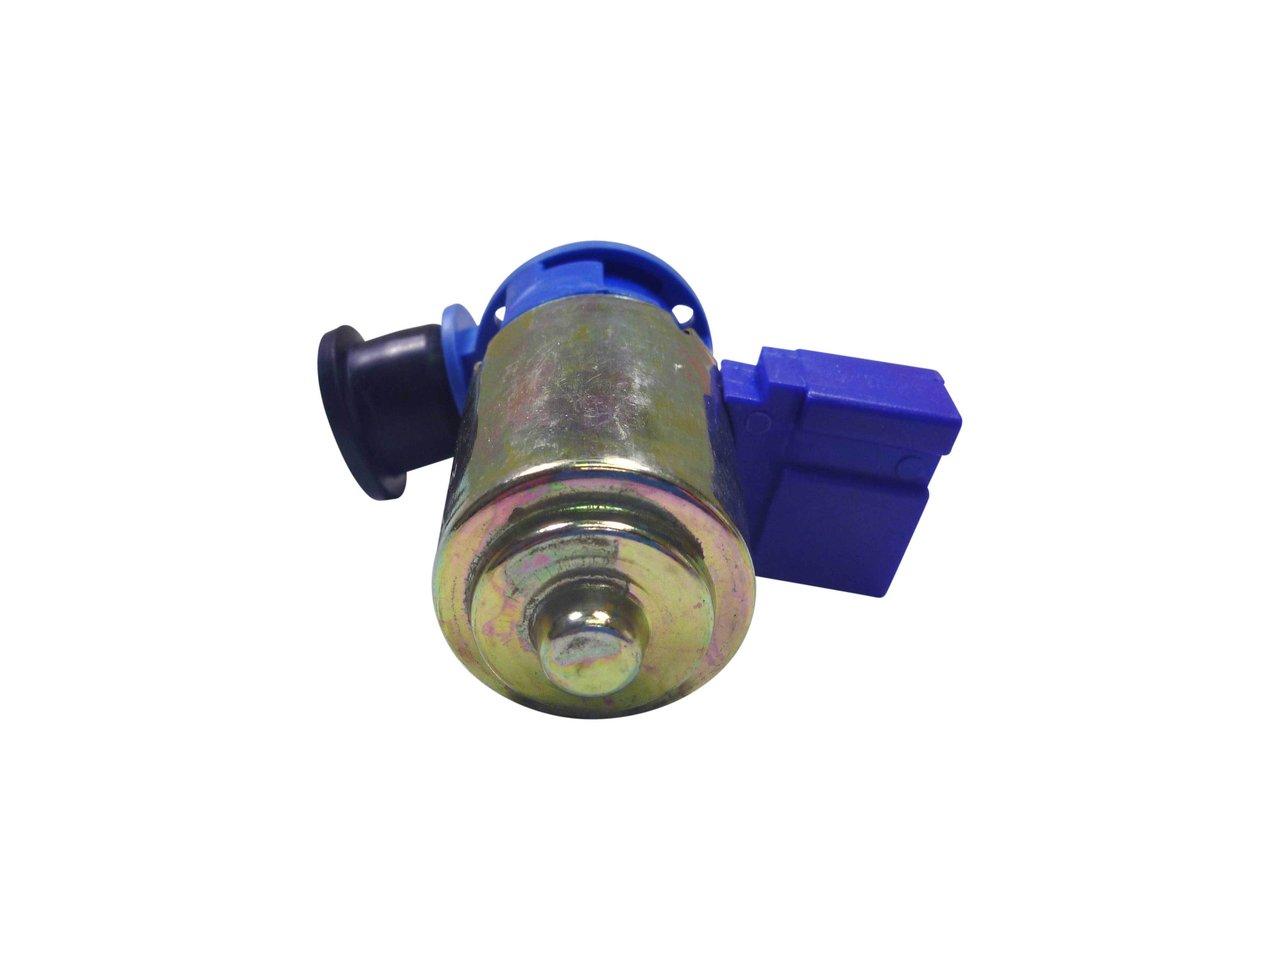 Transfer Pump Nissan Patrol Fuel Reverse Camera Wiring Gu Free Download Diagrams Pictures